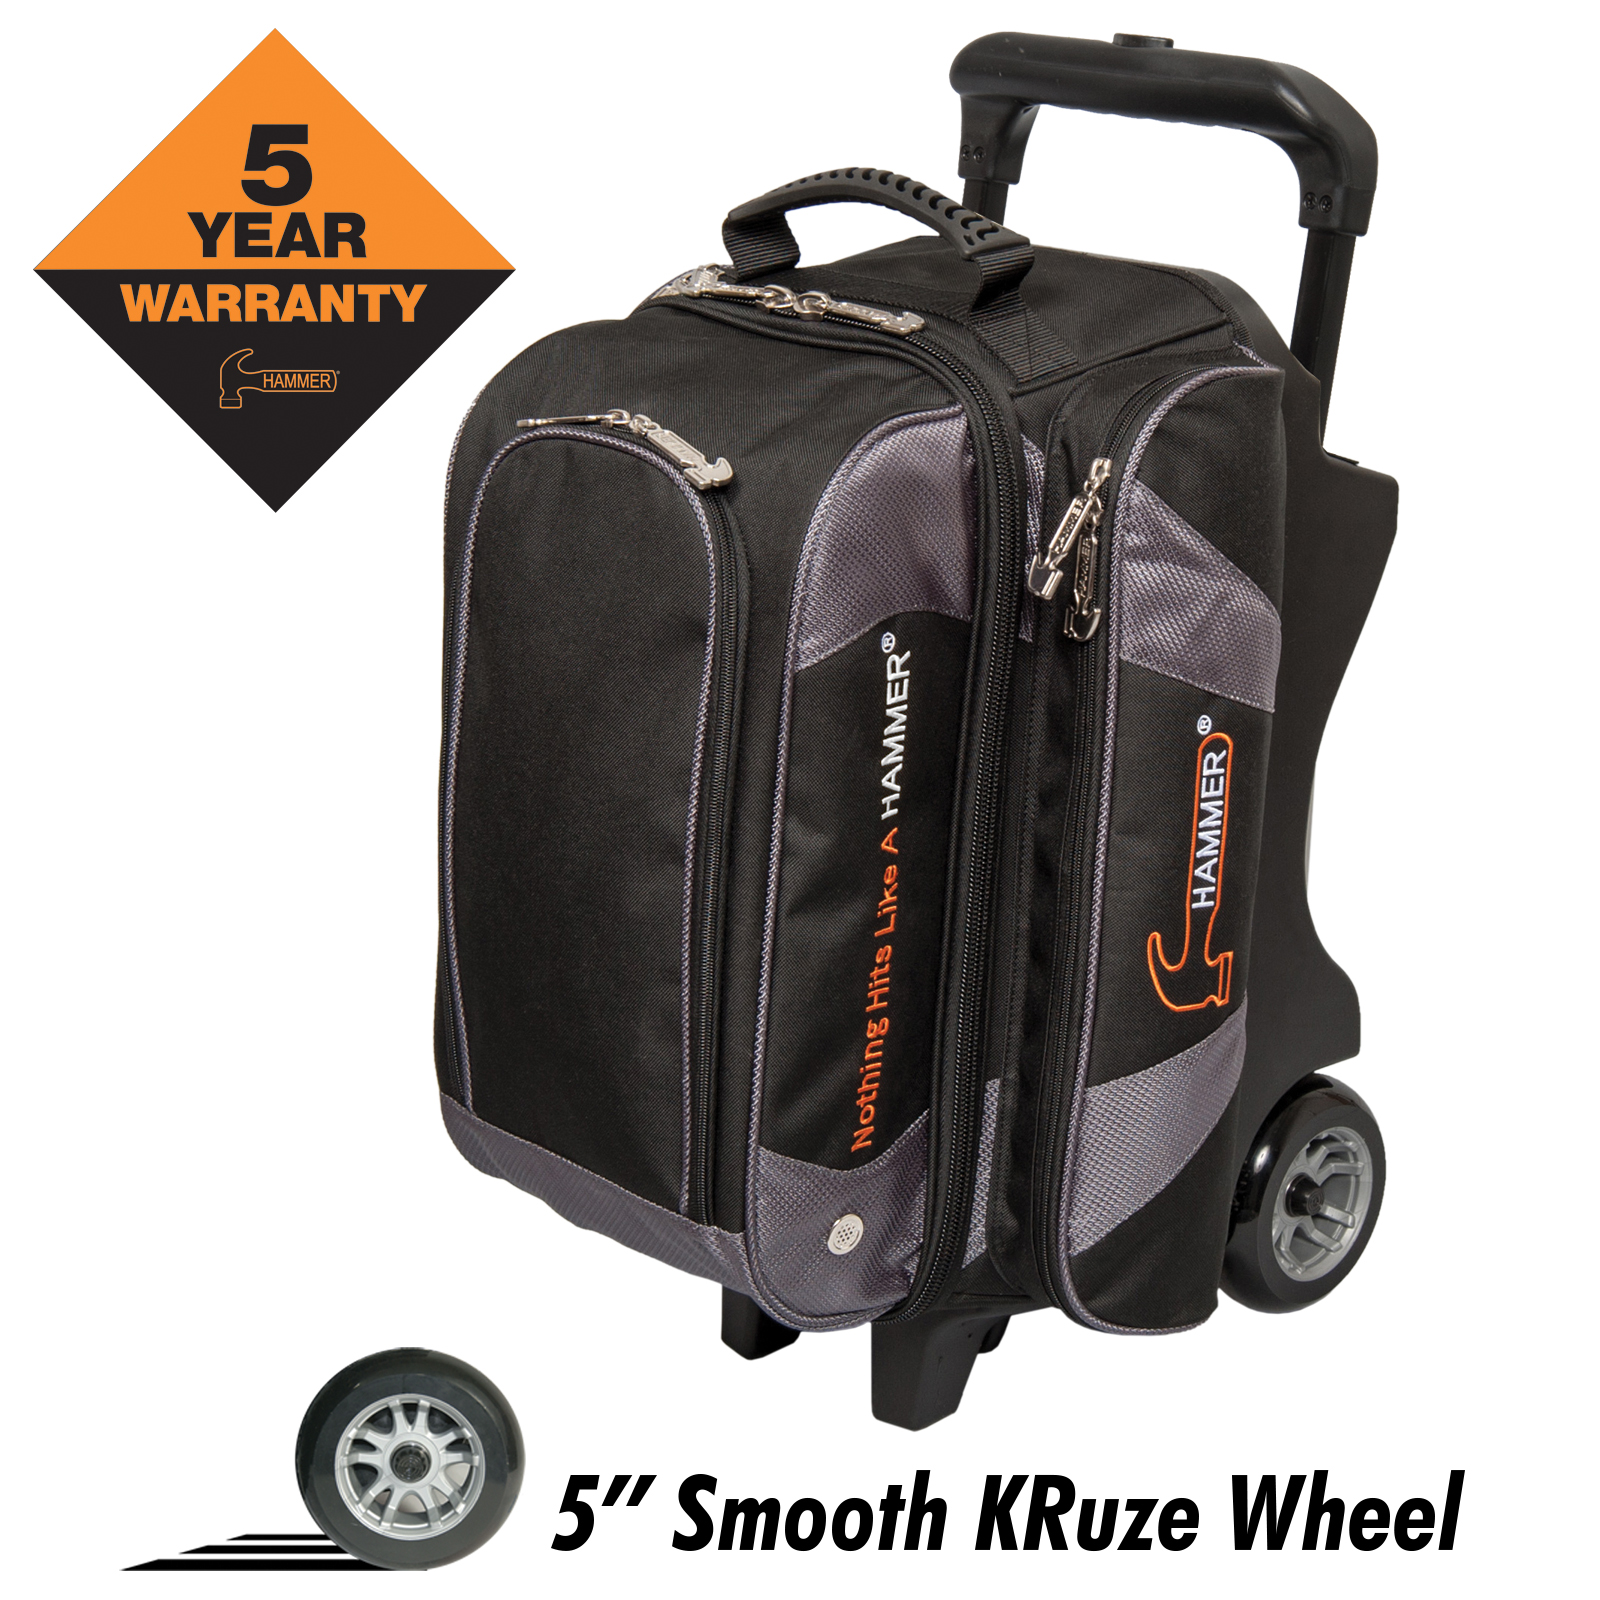 Hammer Premium Two Ball Roller Bowling Bag Black Carbon